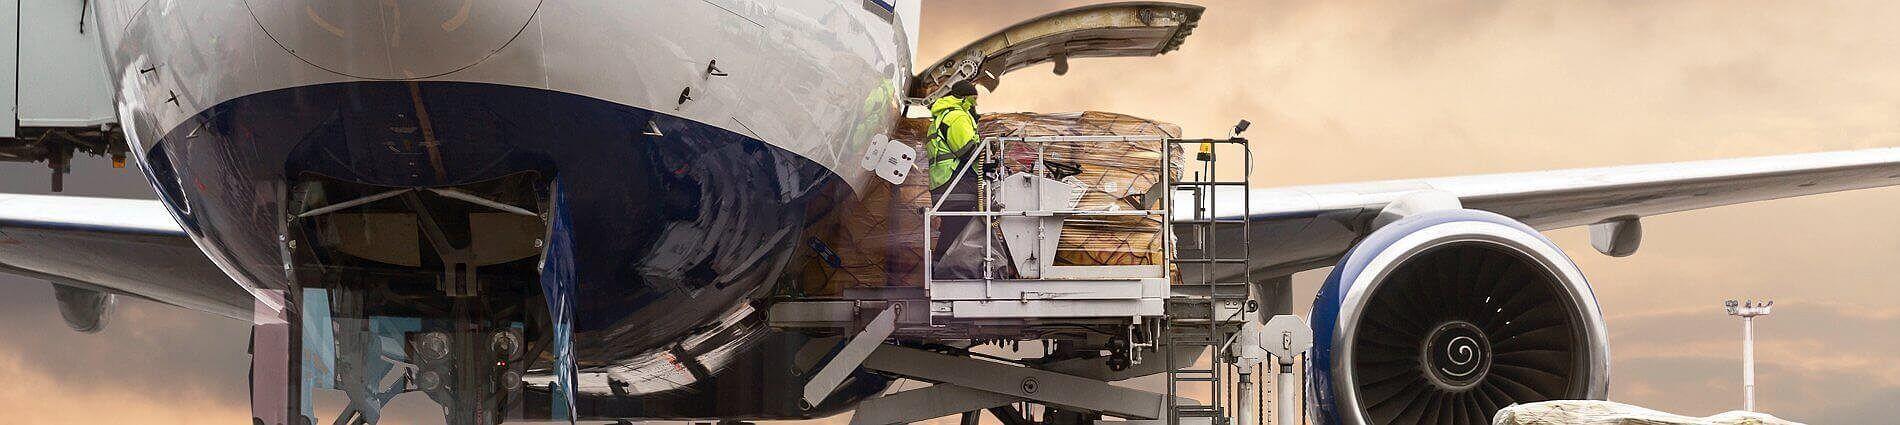 luftfracht spedition sea air transport service. Black Bedroom Furniture Sets. Home Design Ideas